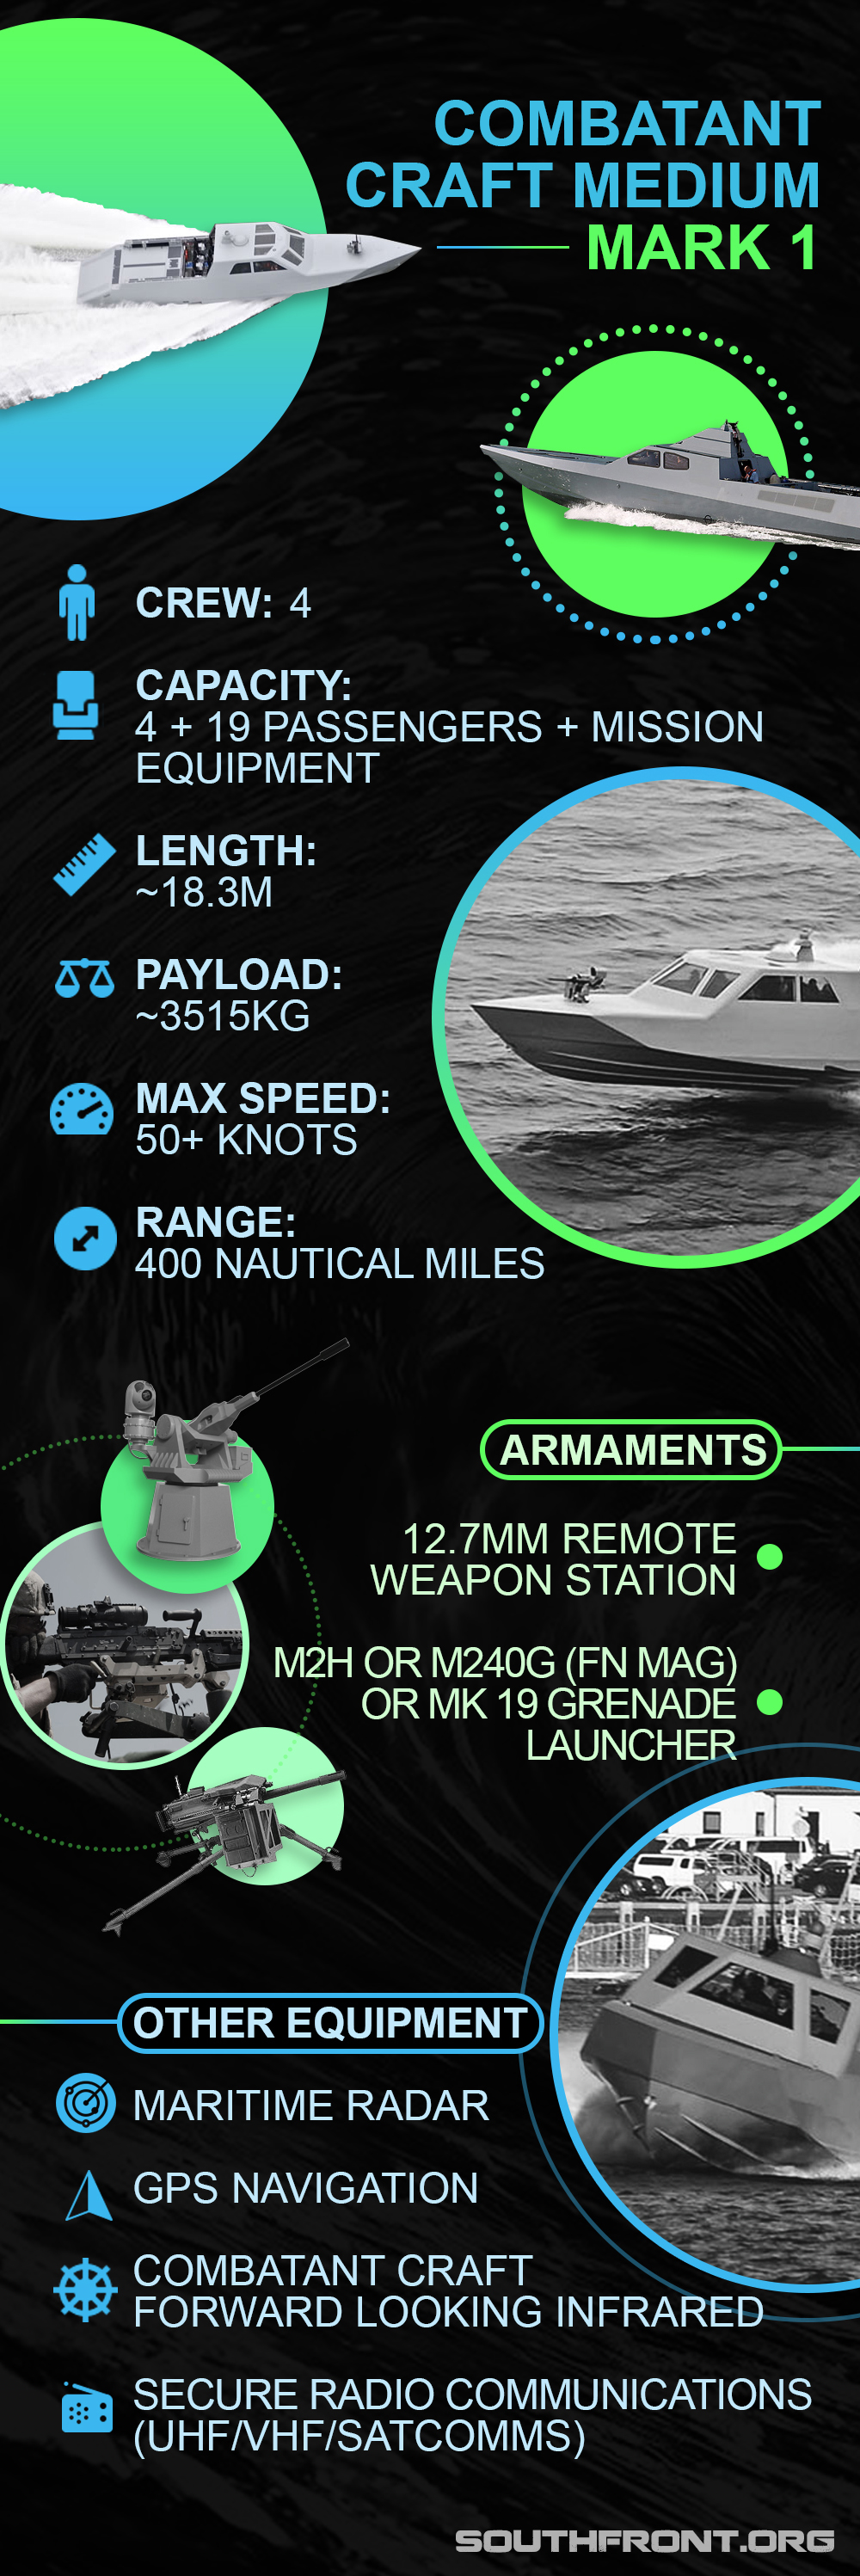 US Navy's Stealth Boat: Combatant Craft Medium Mark 1 (Infographics)